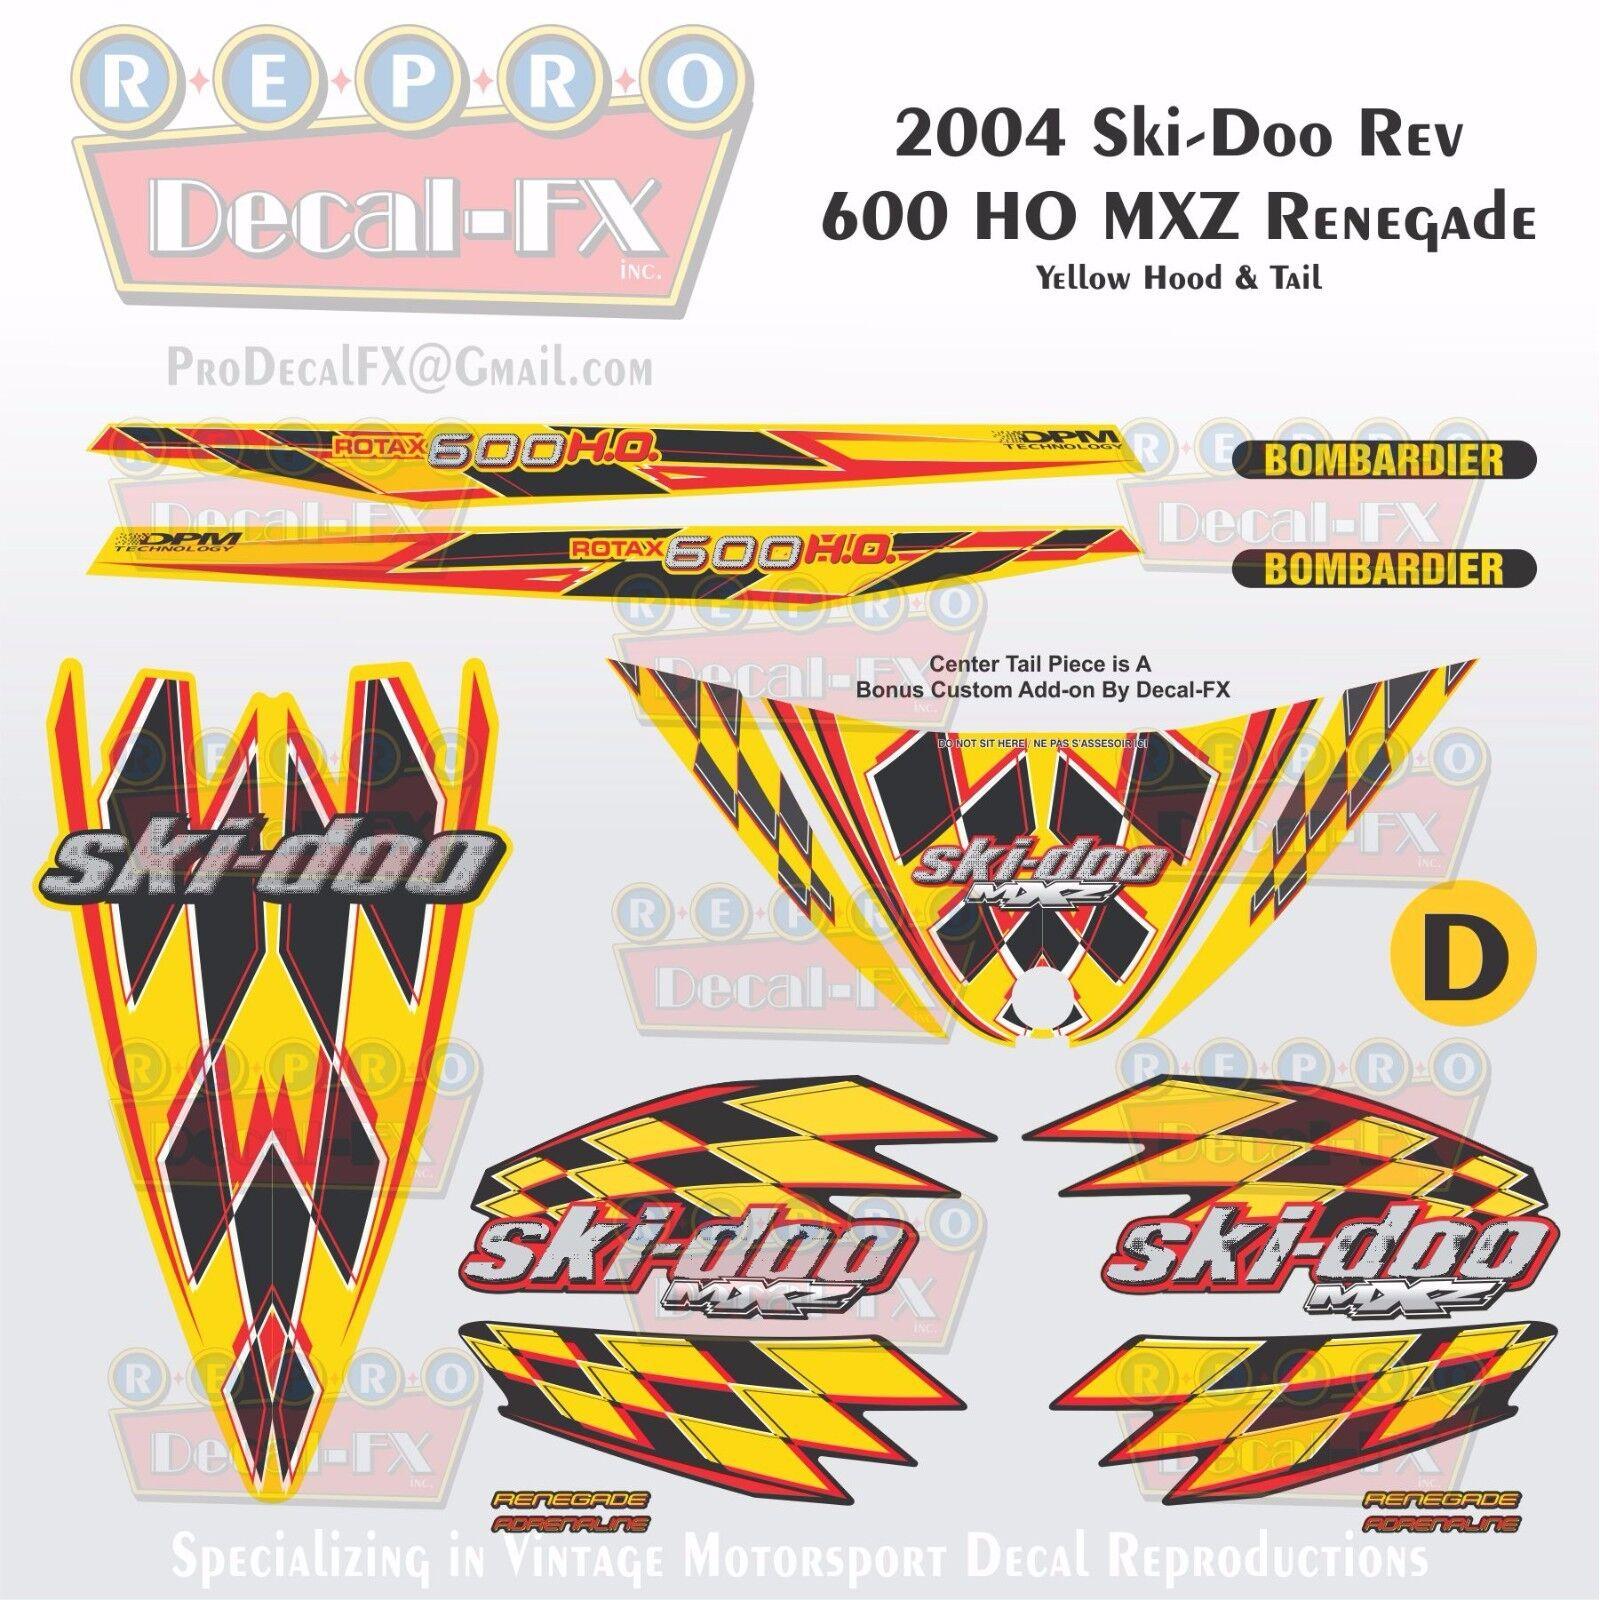 2004 Ski-doo MXZ600HO Yellow Hood & Tail Rev Reproduction Vinyl Decals16Pc DPM